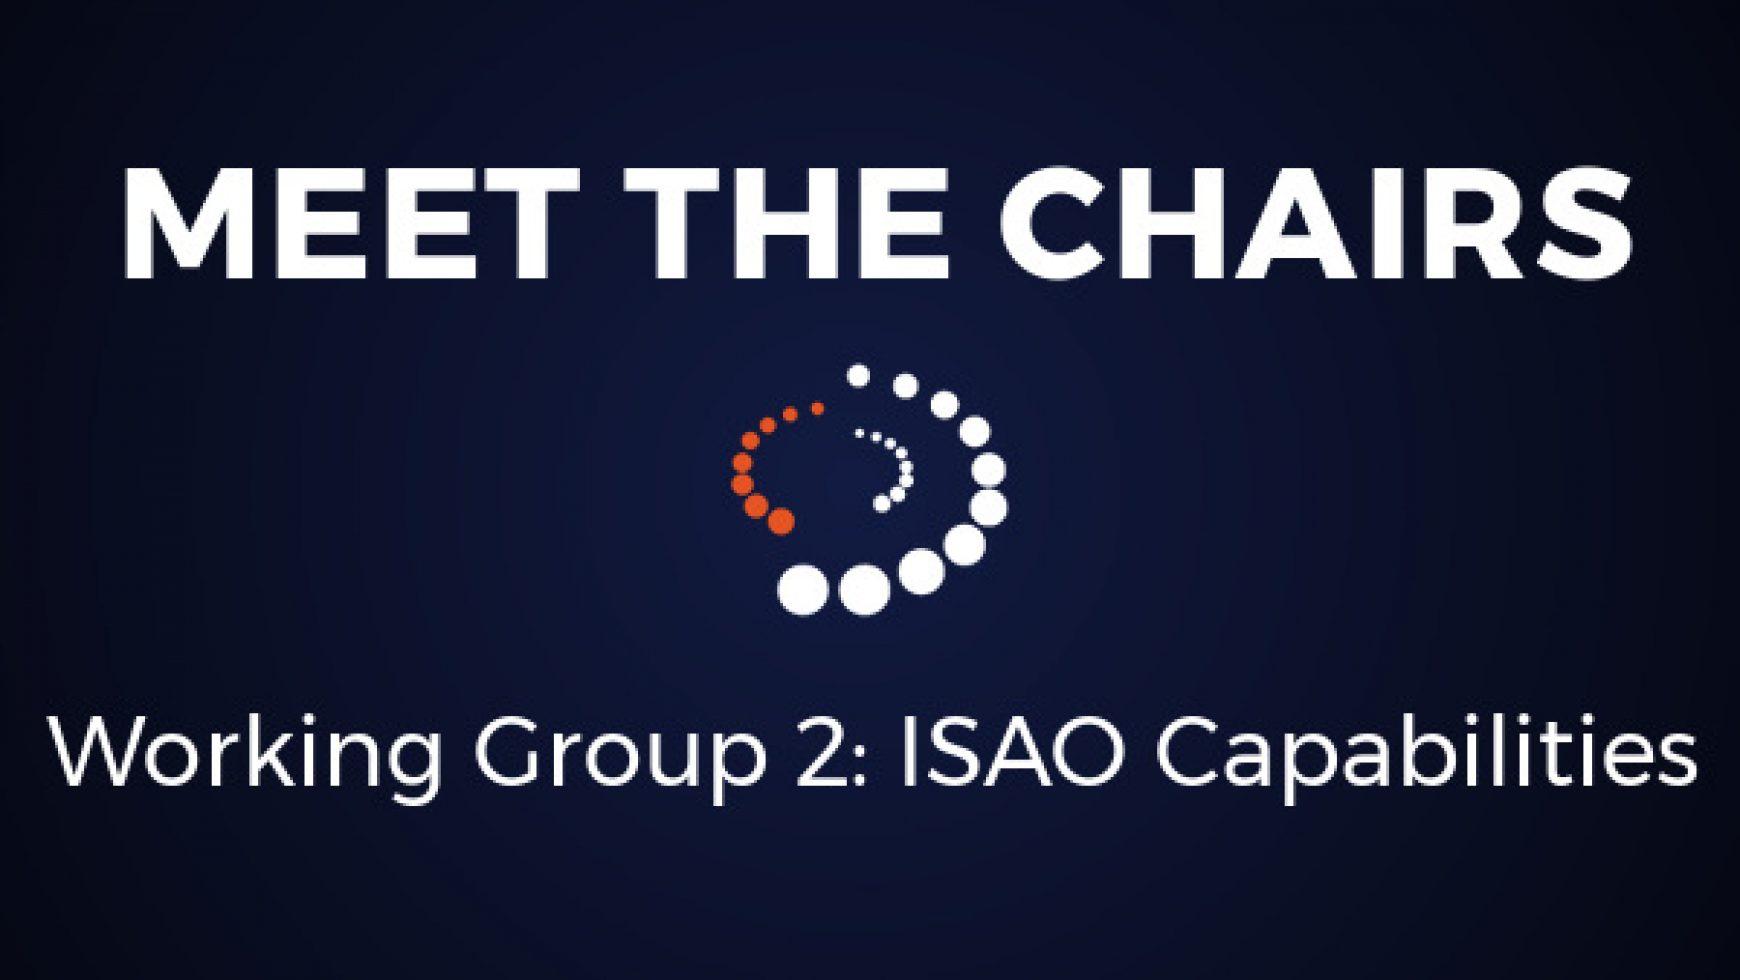 Meet the Chairs: Working Group 2 ISAO Capabilities